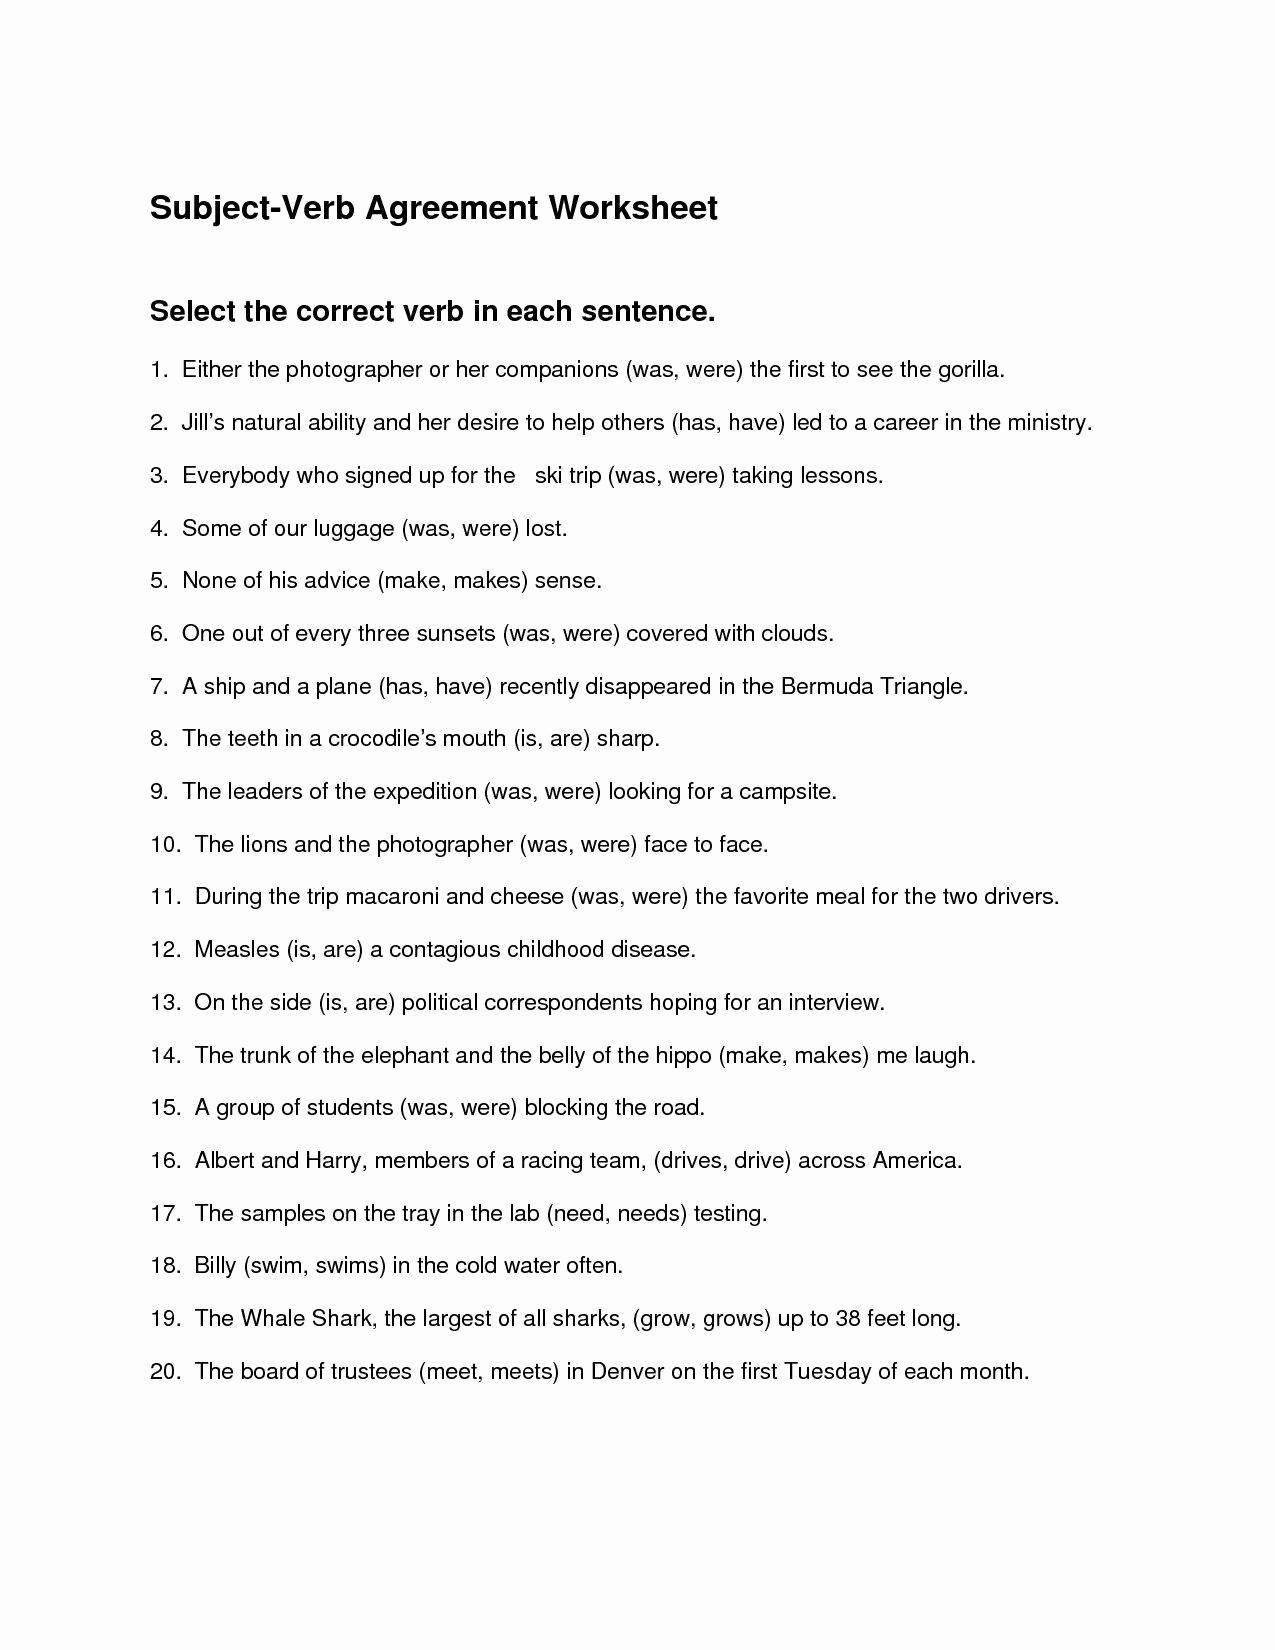 Correlative Conjunctions Worksheet 5th Grade Inspirational 20 Correlative Conjunctions Worksheet 5th Grade